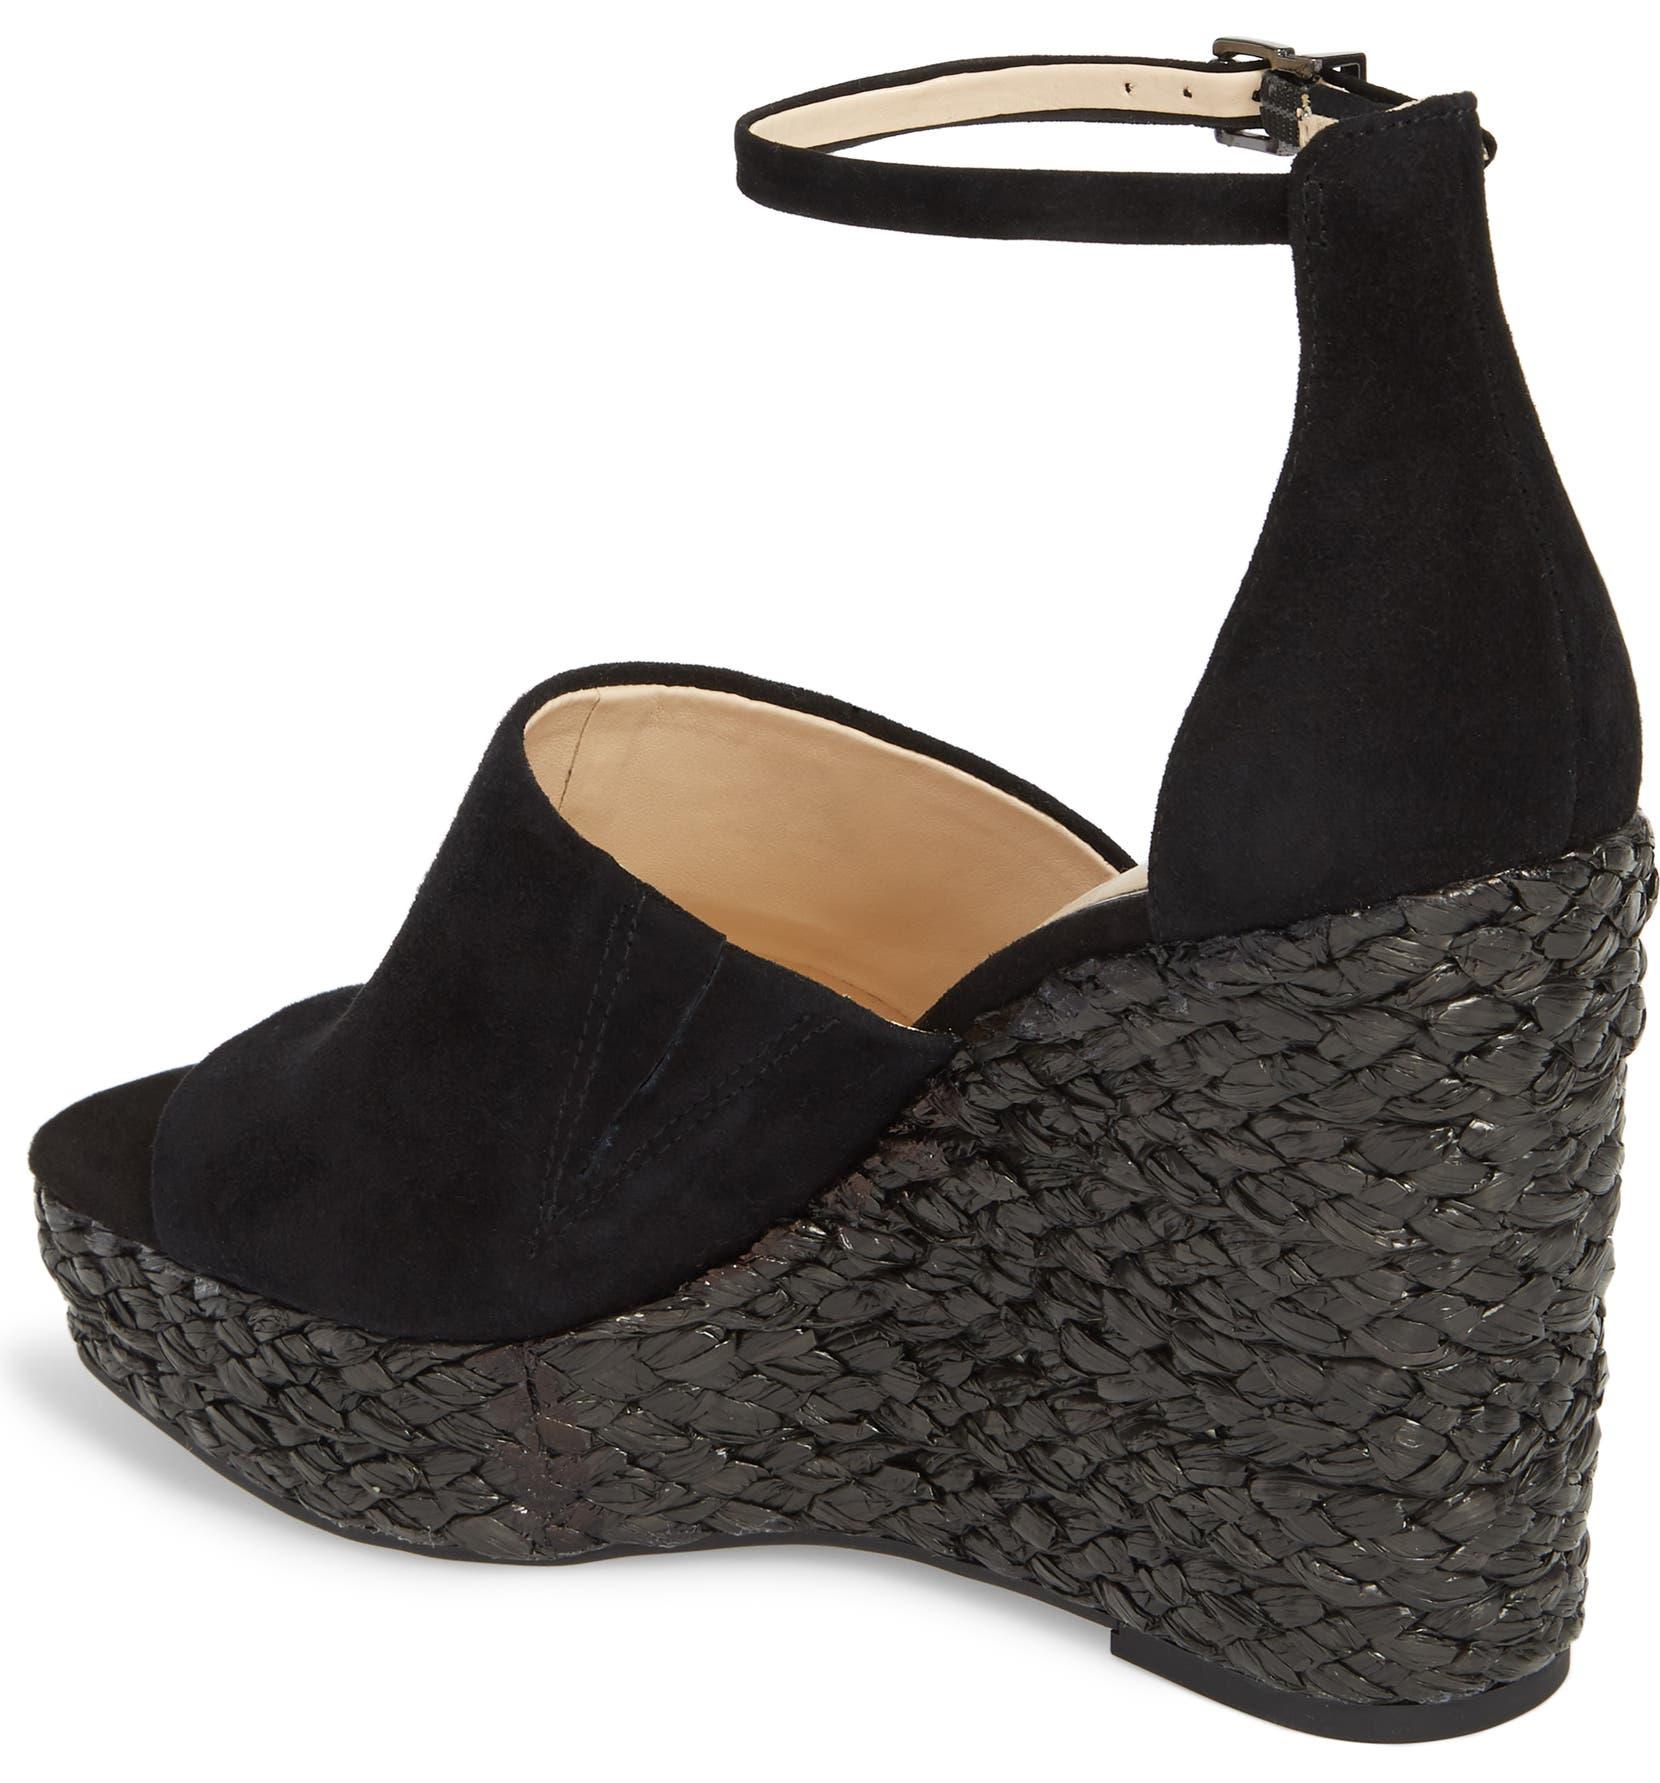 08b011144cf Suella Wedge Sandal